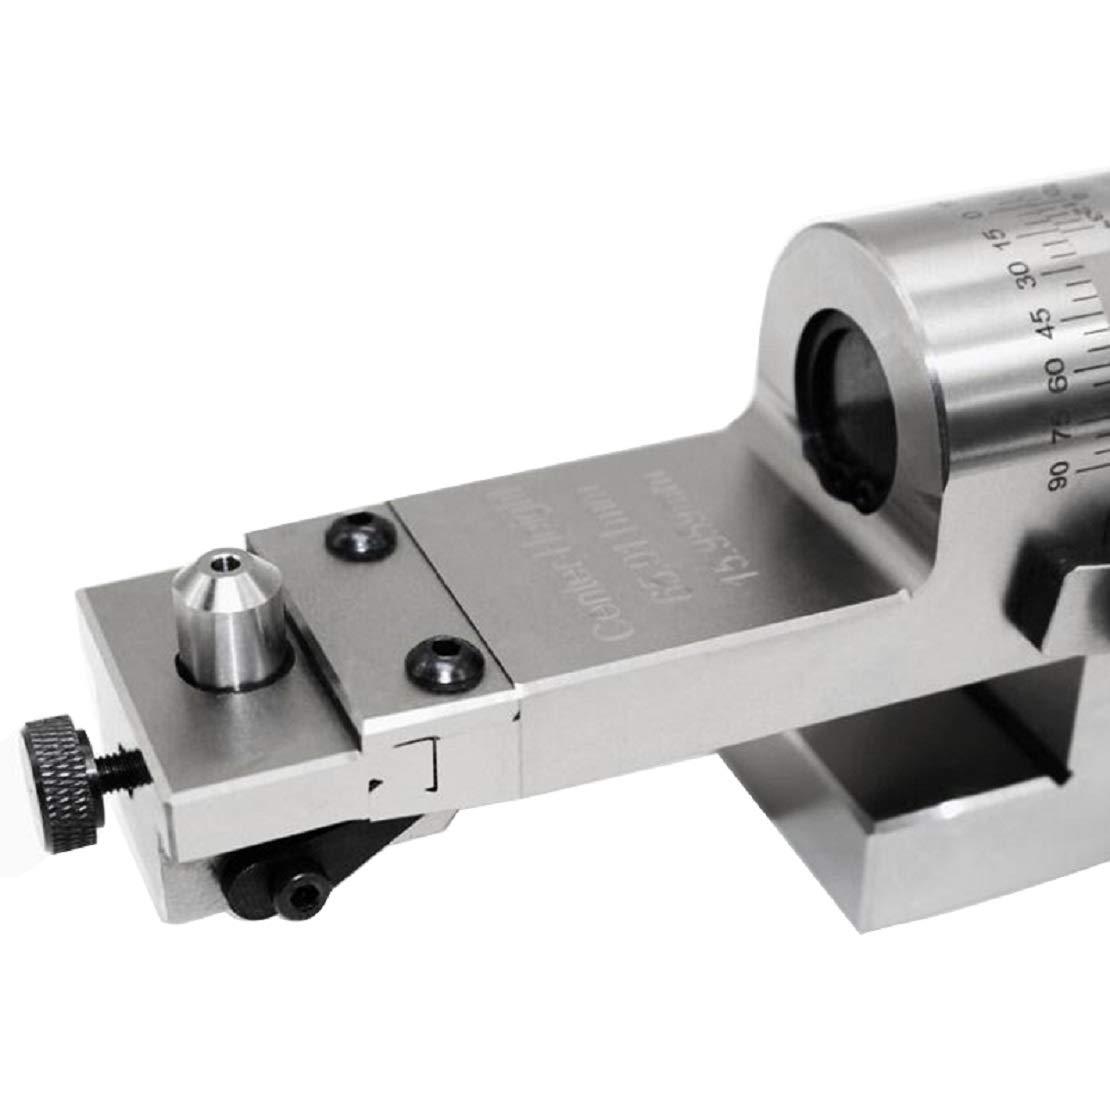 Perspective Grinding Wheel Dresser Visual Optical Radius Angle Dresser Value Line Optical Grinding Wheel Radius Angle Dresser by tinsay (Image #6)